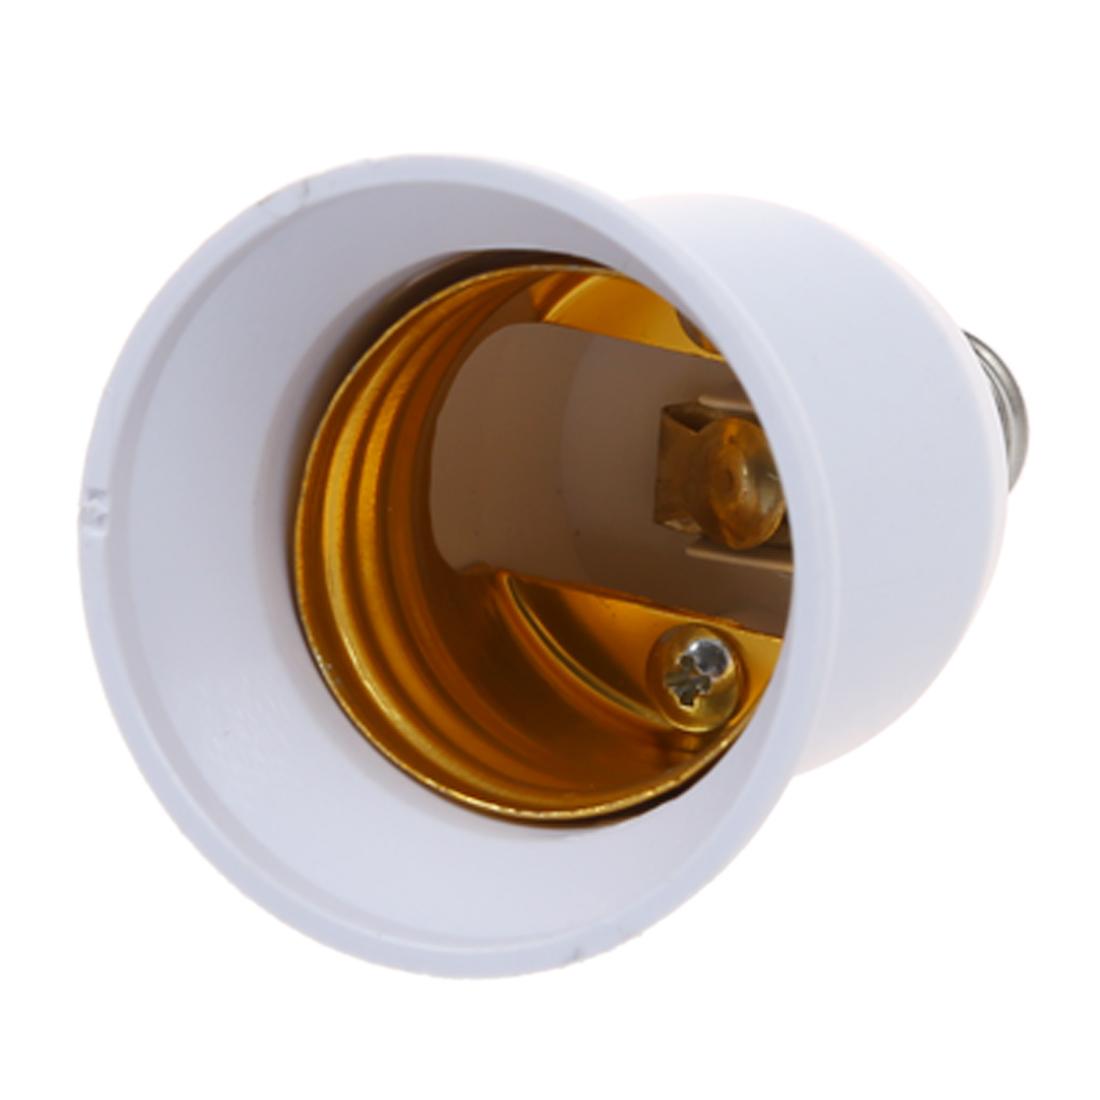 10 x candelabra light bulb lamp socket enlarger adapter r2h4 ebay Light bulb socket